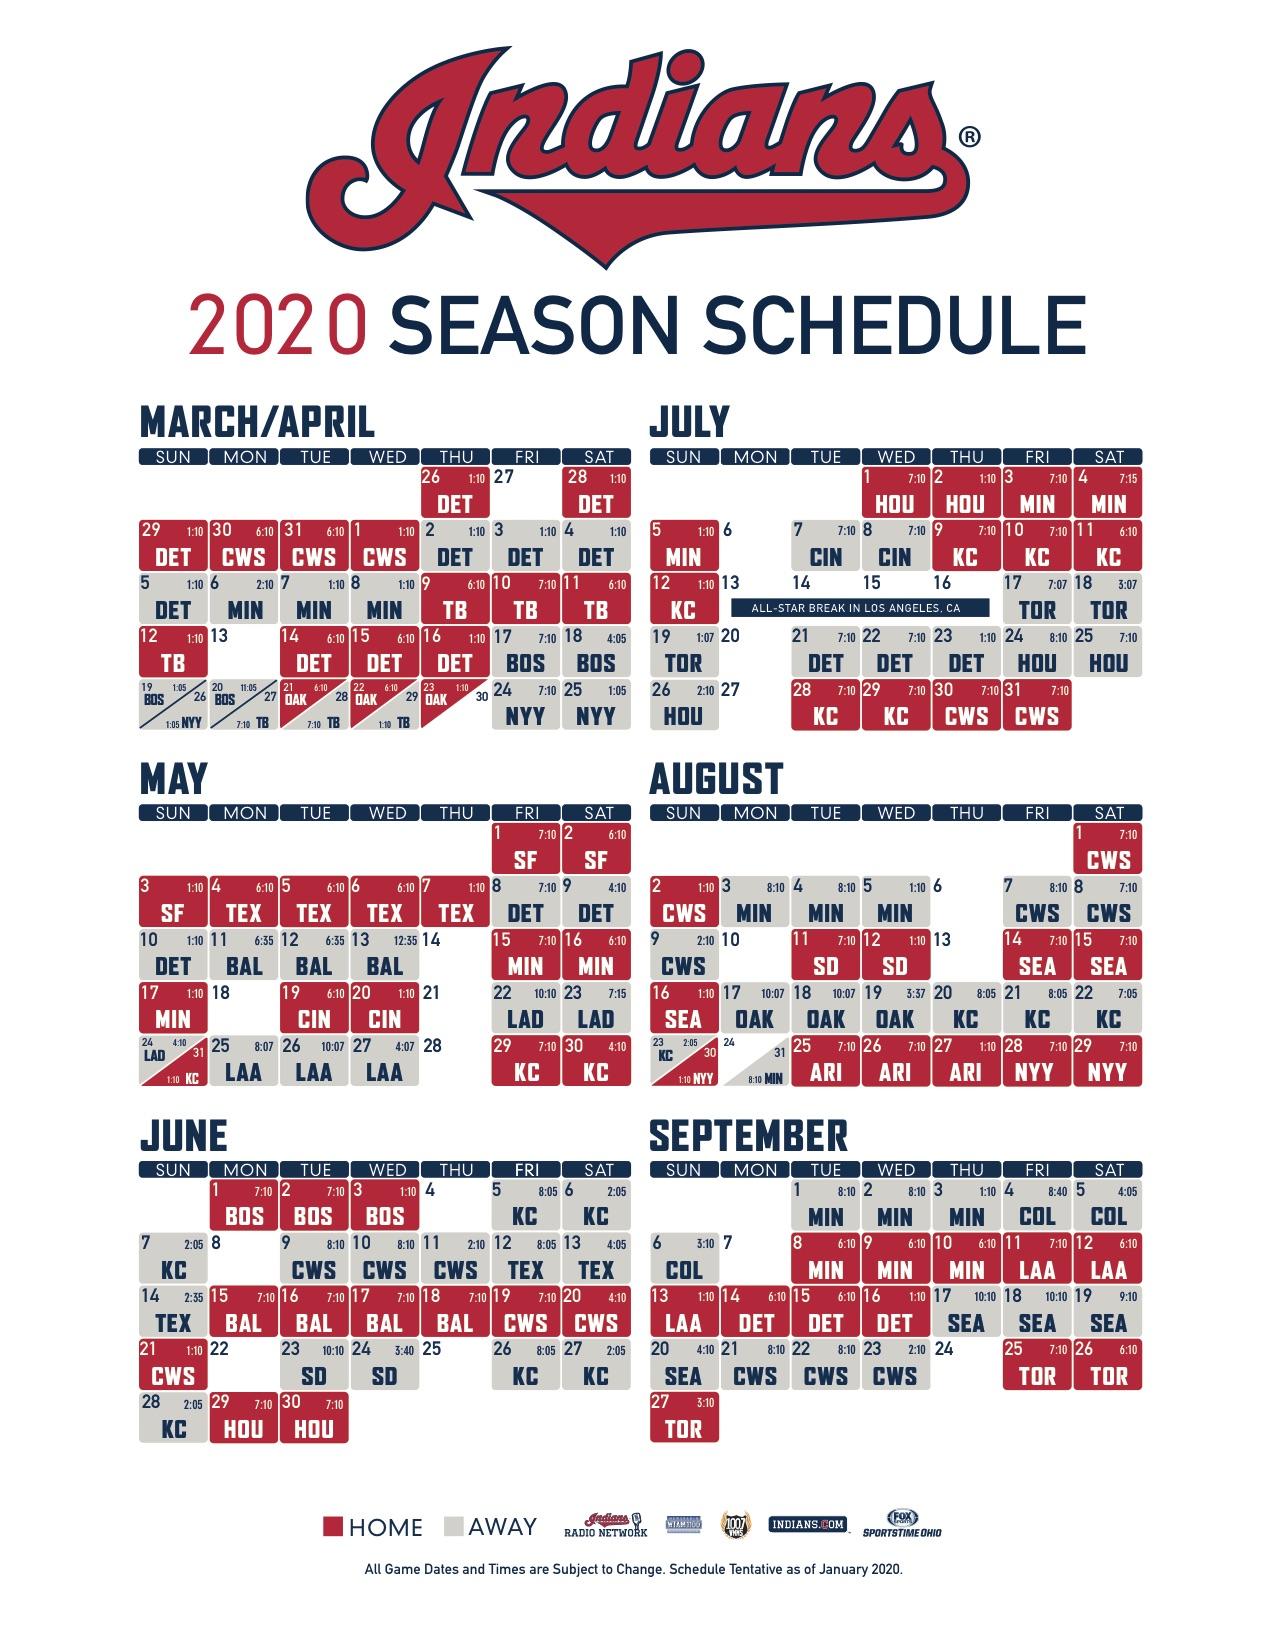 Mlb schedule 2020 regular season